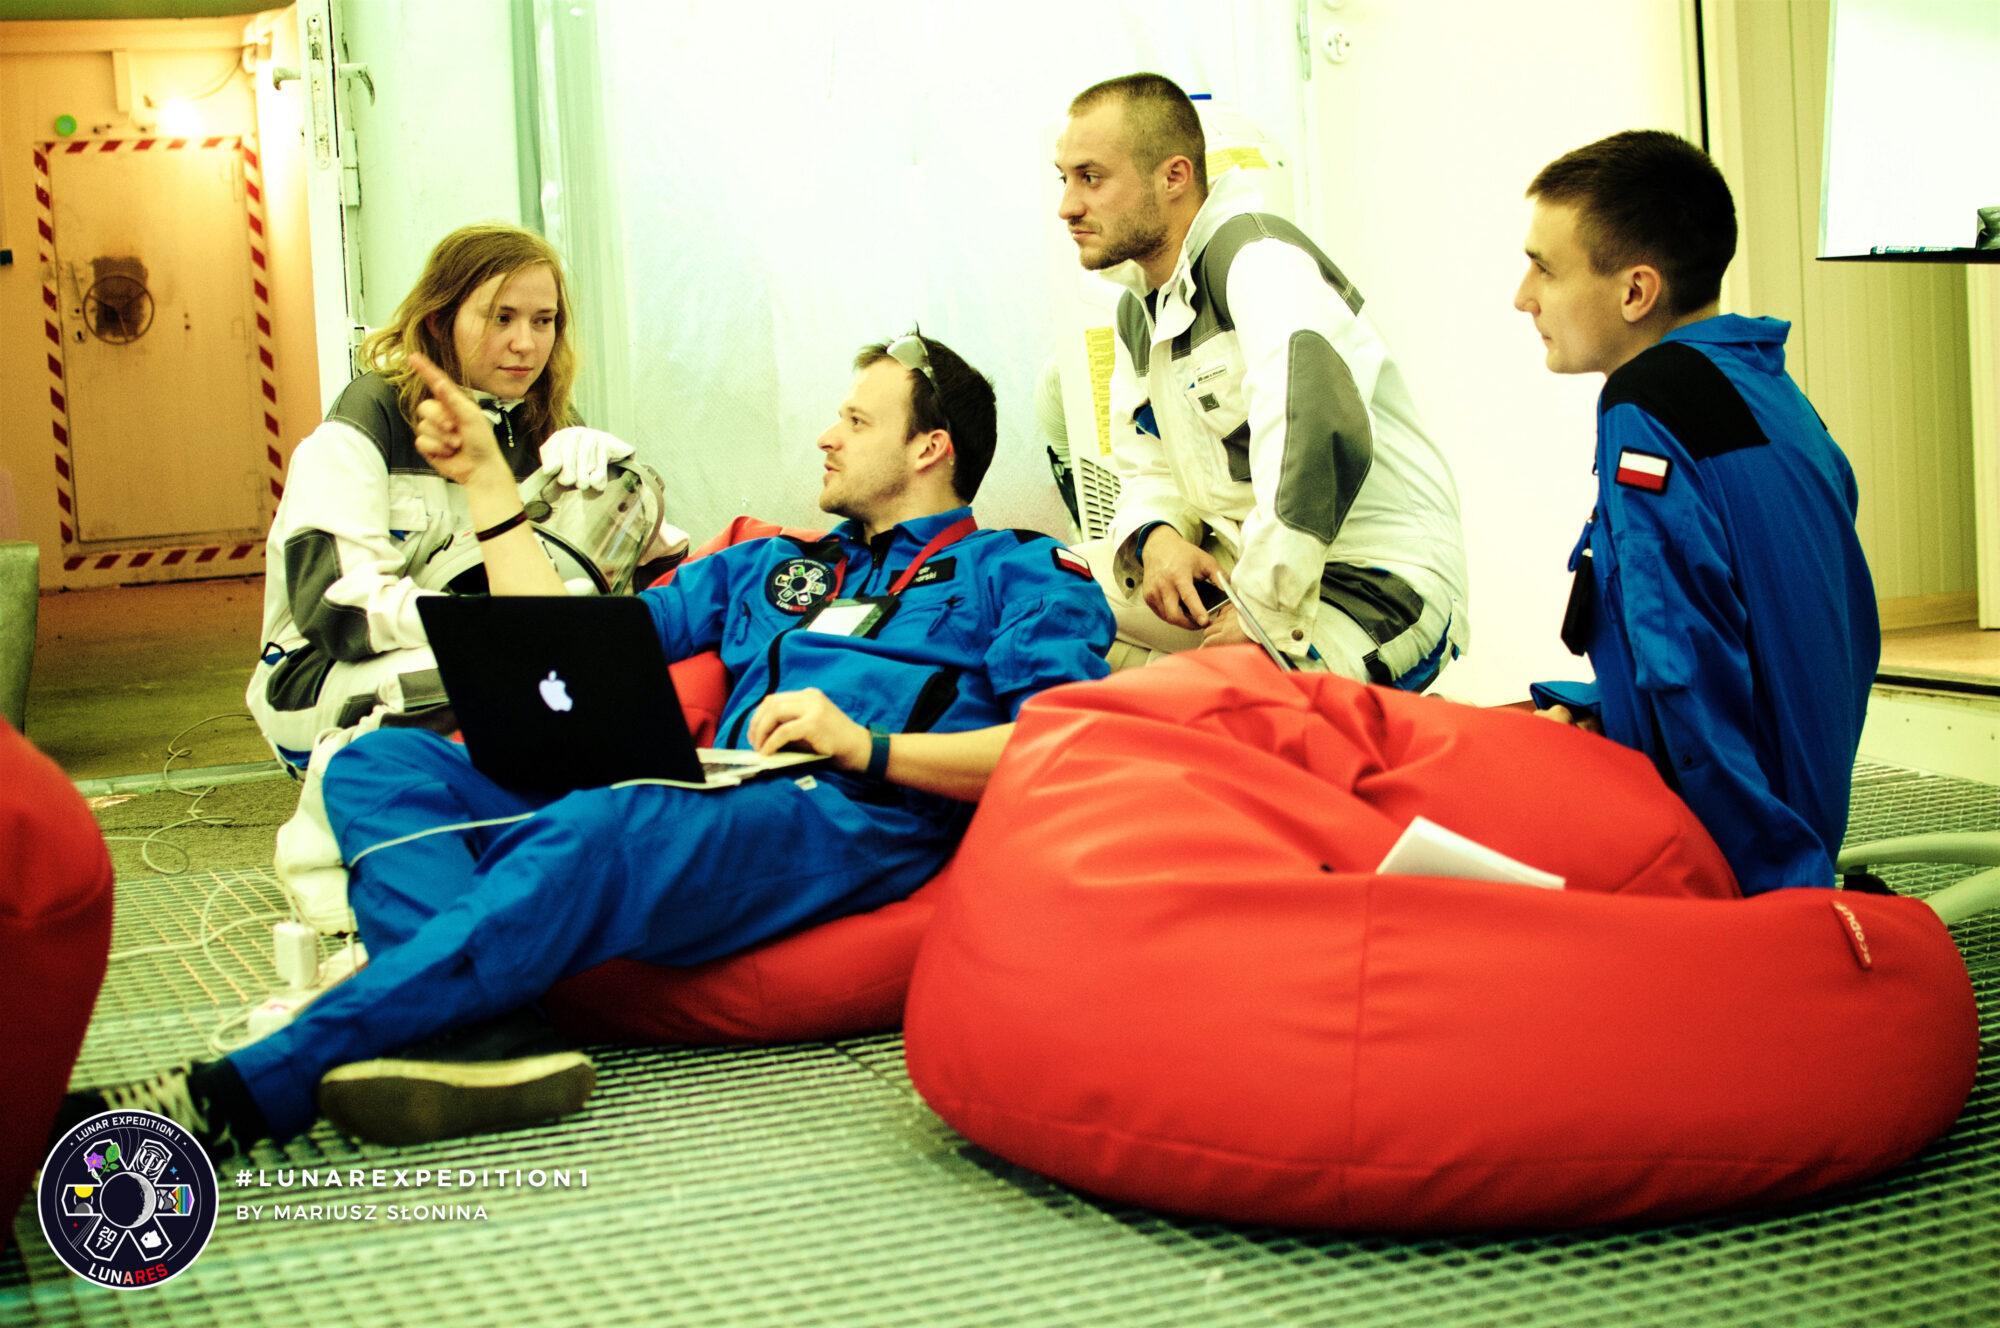 lunar-expedition-01/ND_20170821_215719_2359_001.jpg